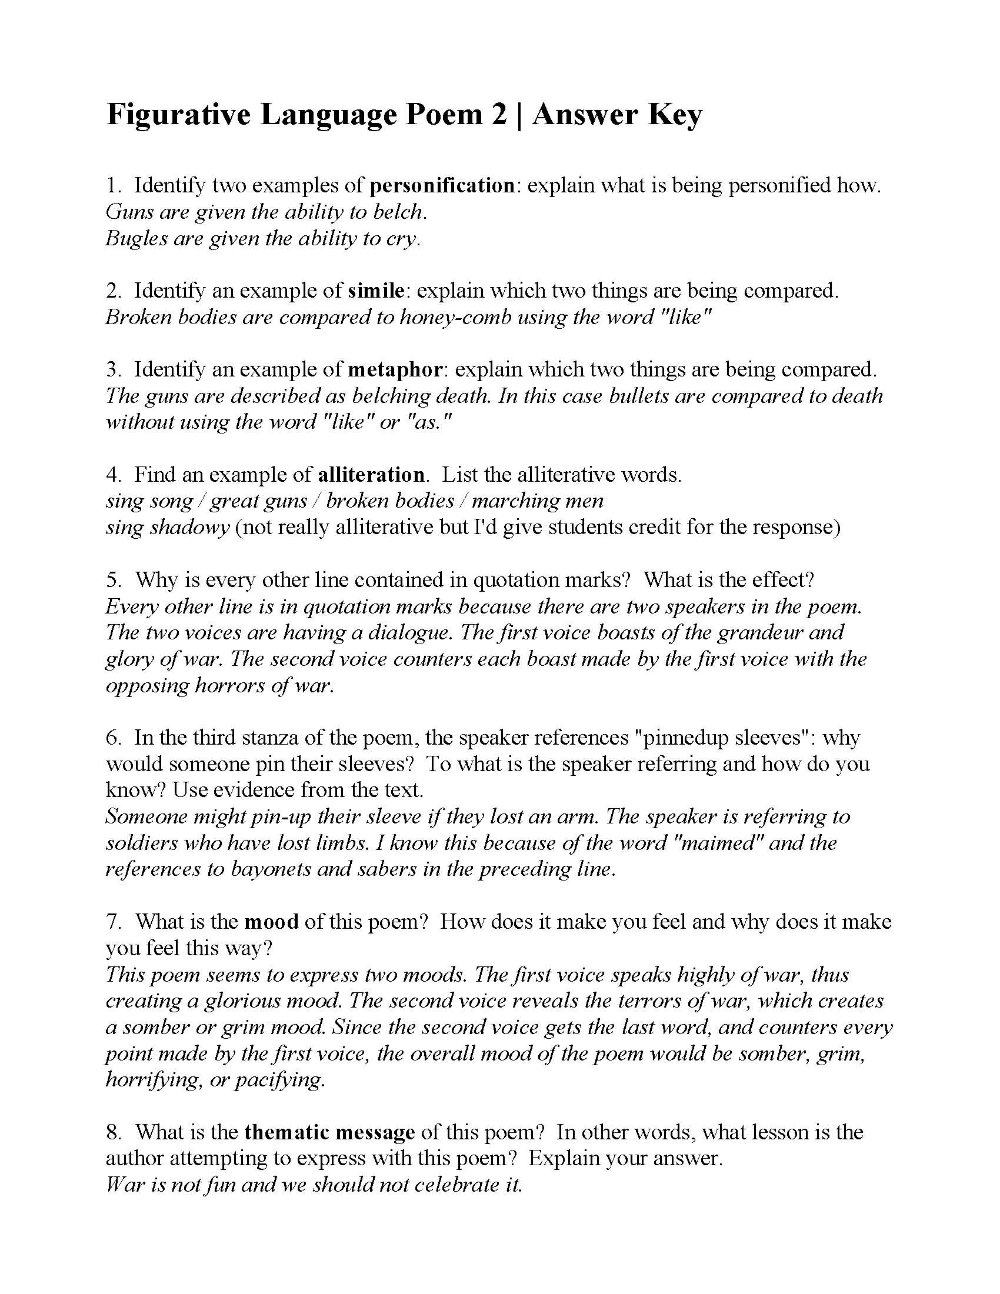 Figurative Language Poem 2 I Sing The Battle By Harry Kemp Answers Figurative Language Poems Figurative Language Worksheet Language Worksheets [ 1294 x 1000 Pixel ]